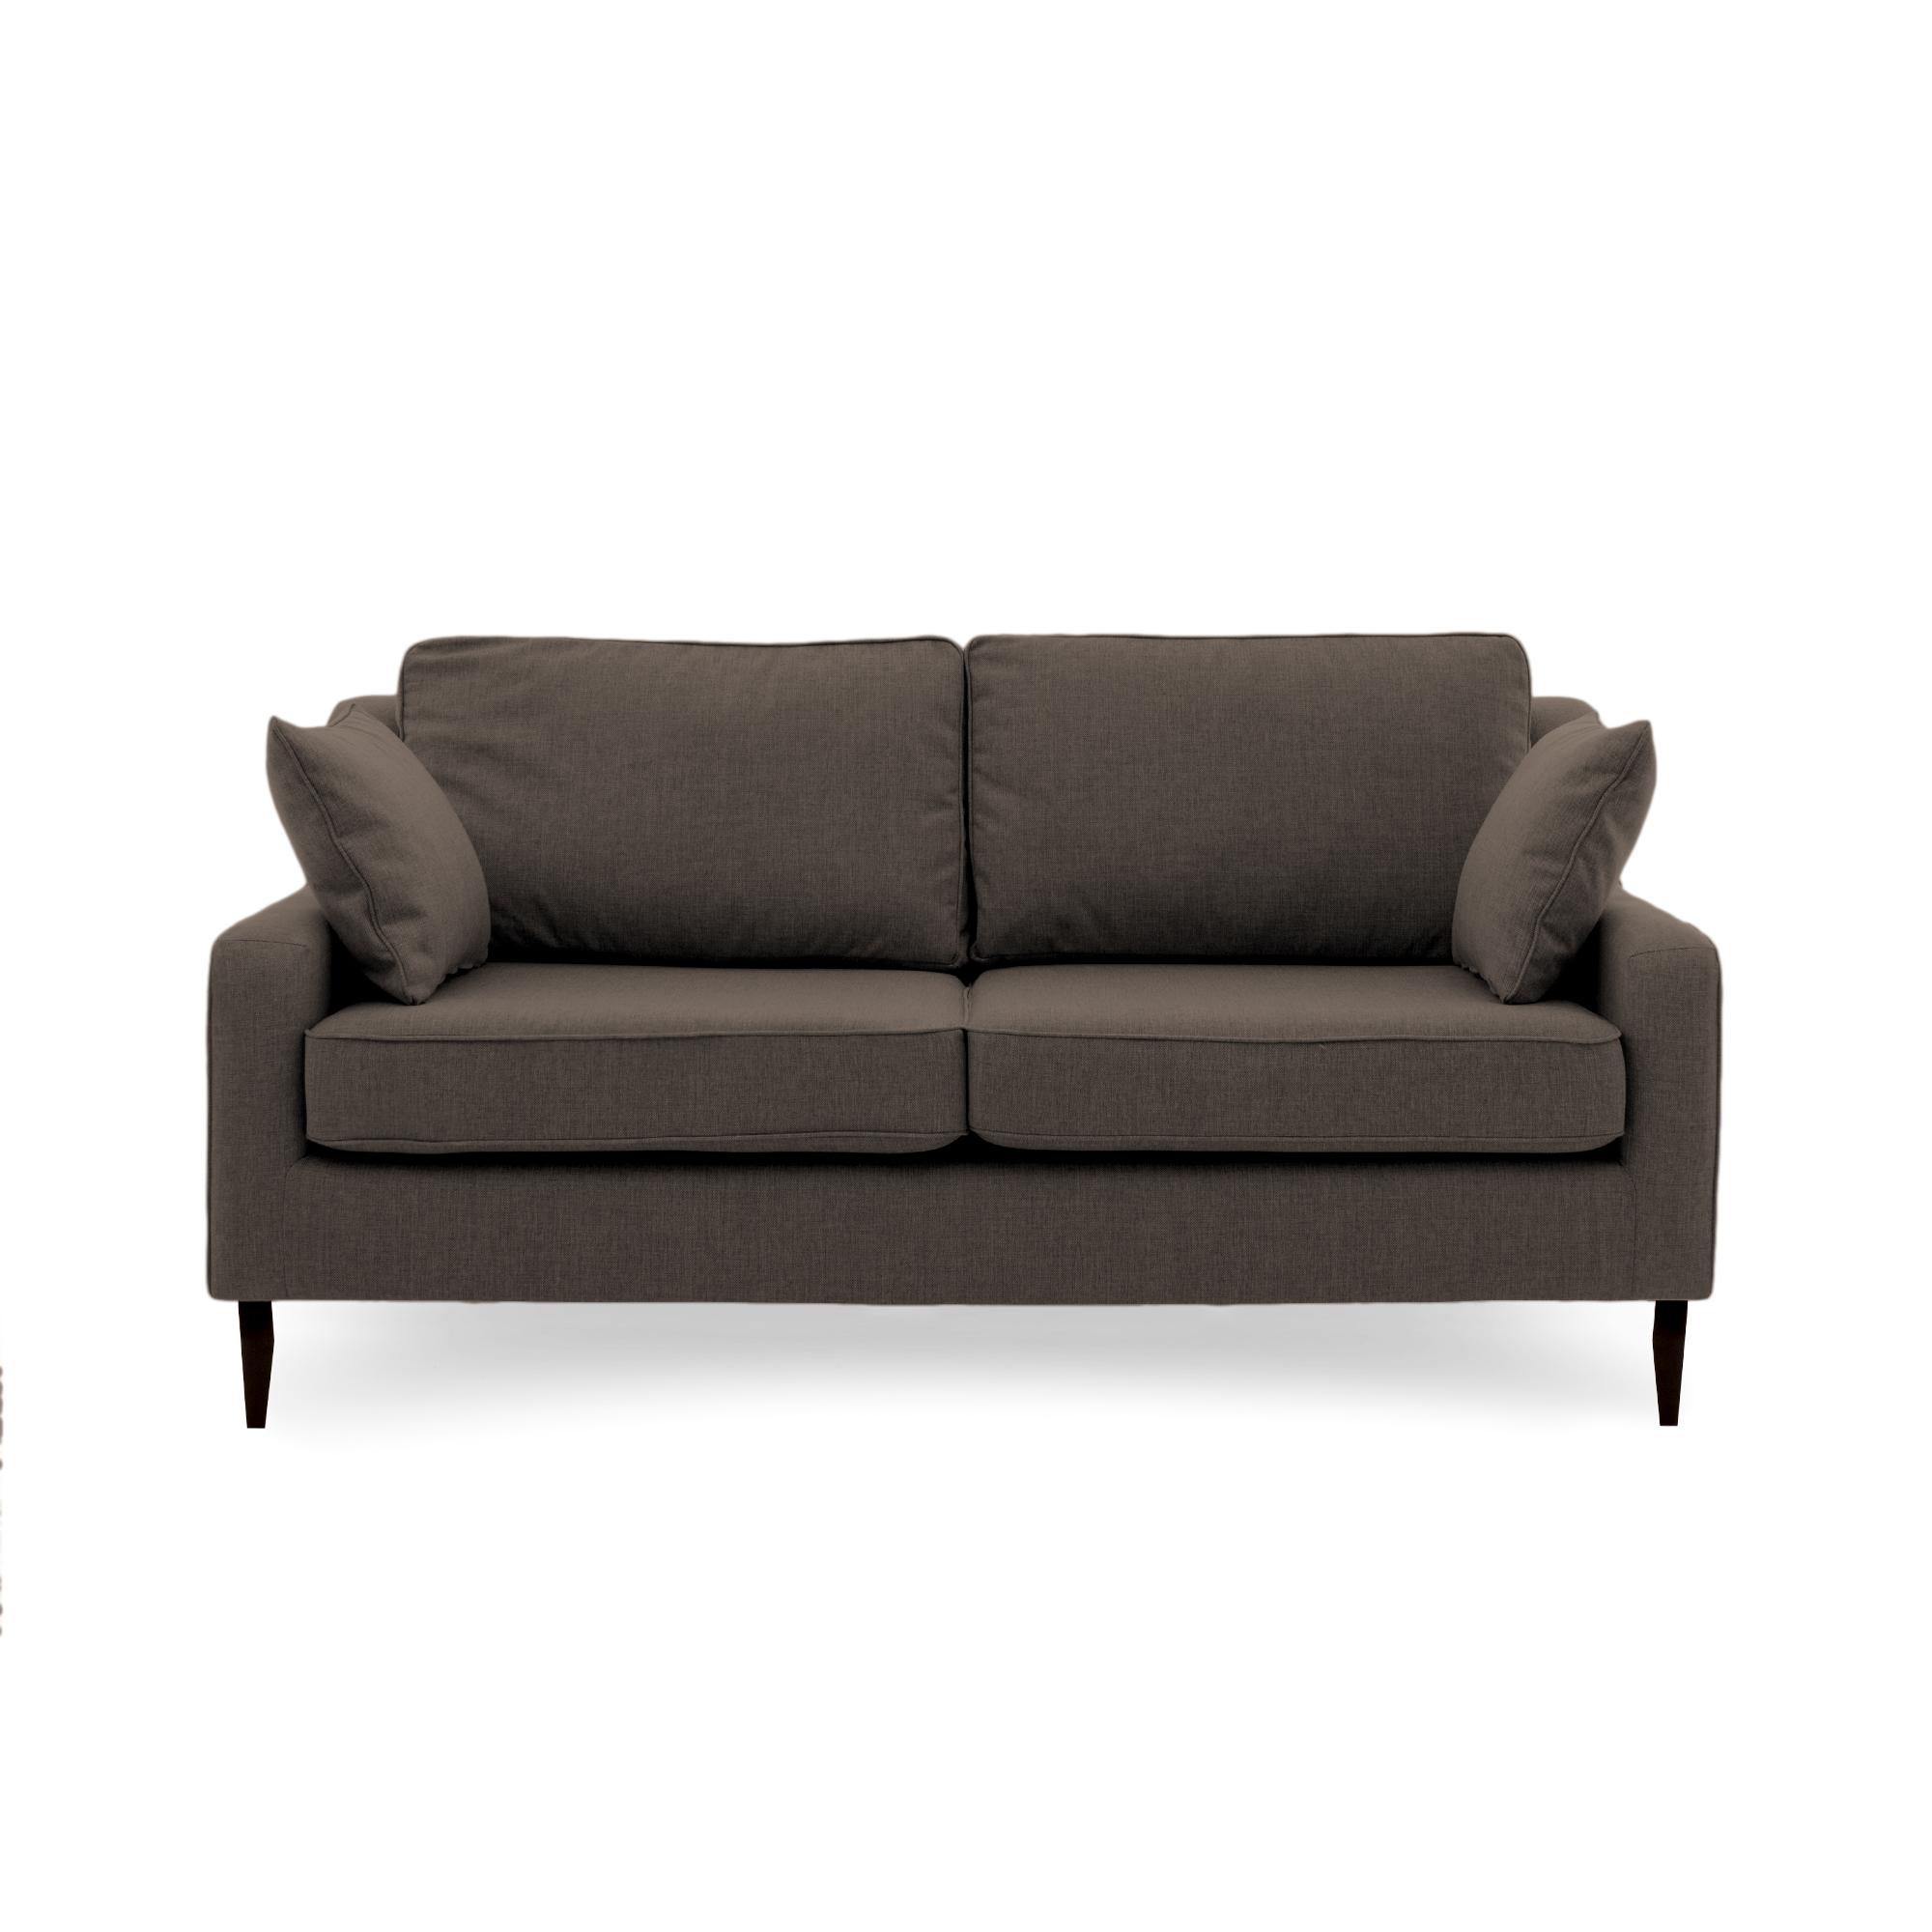 Canapea Fixa 3 locuri Bond Brown